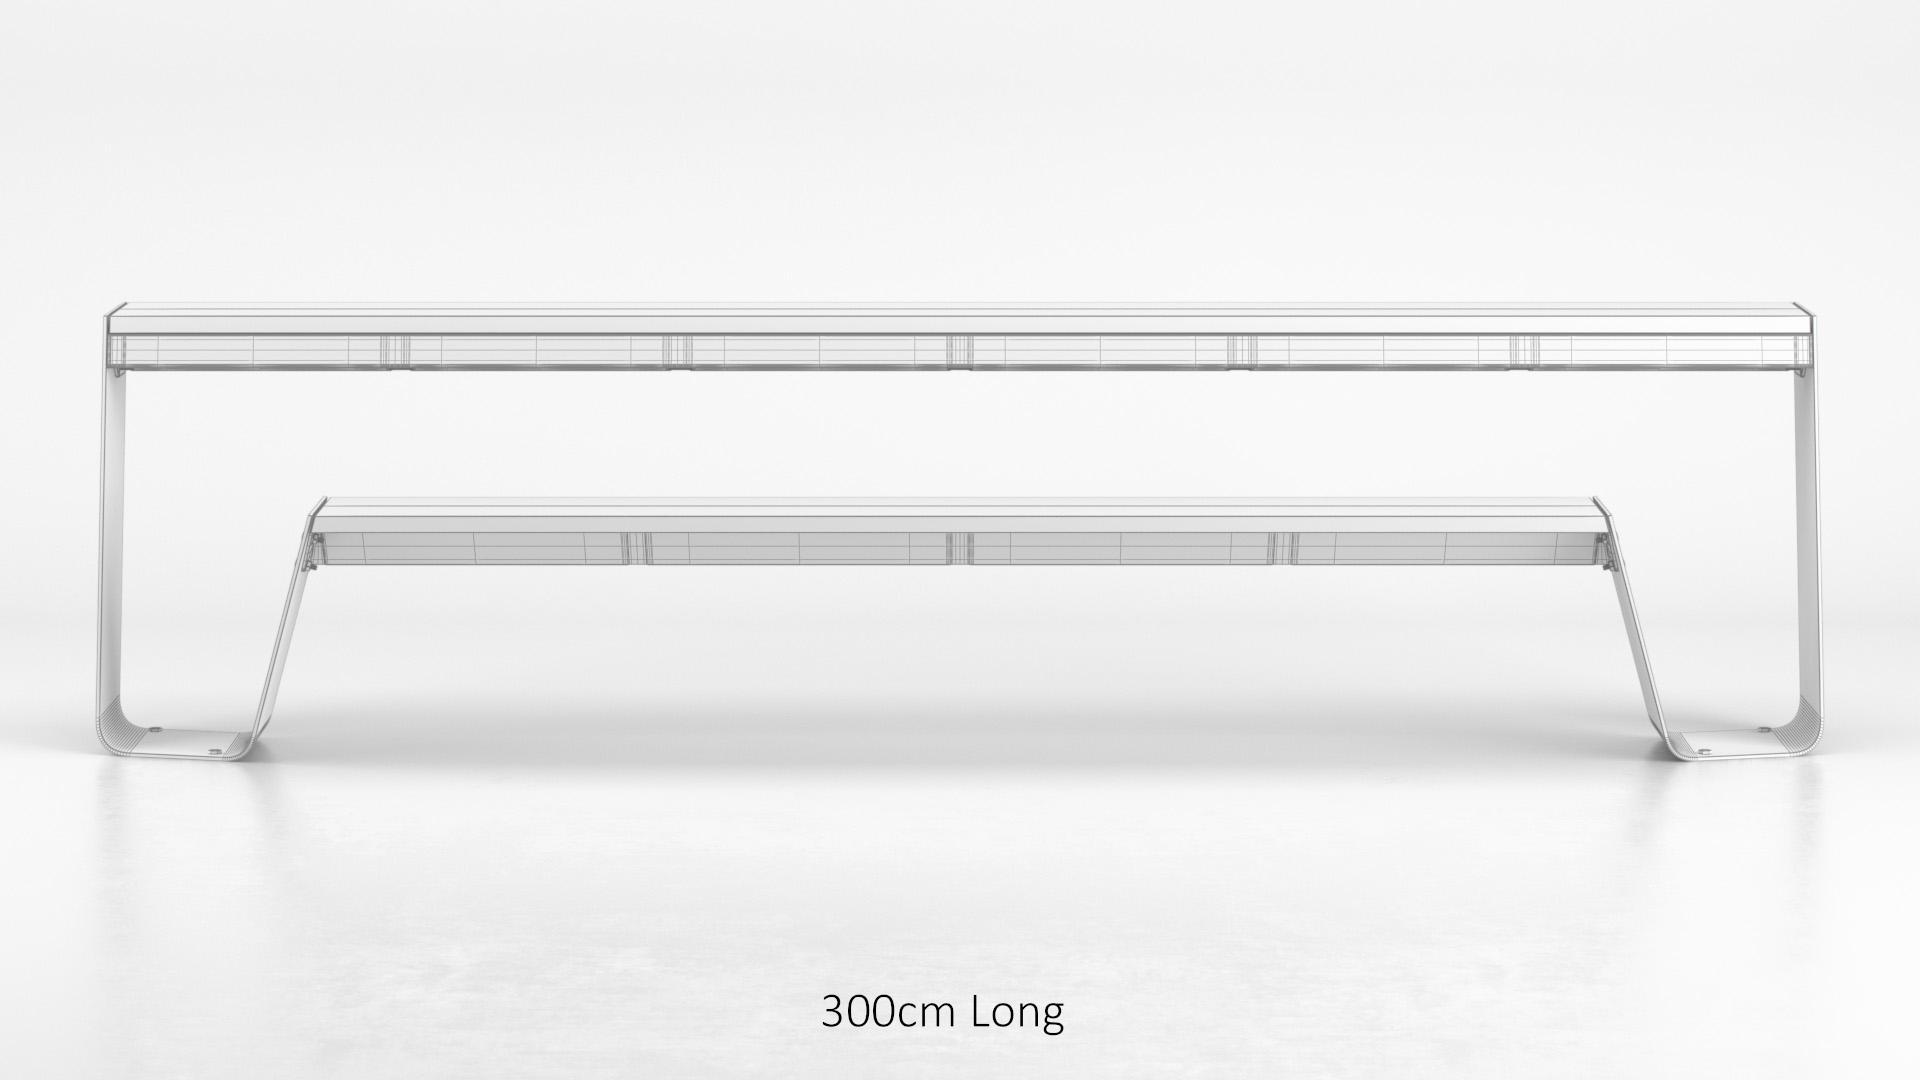 extremis_hopperbench_300cm_whiteset_01_wire_0001